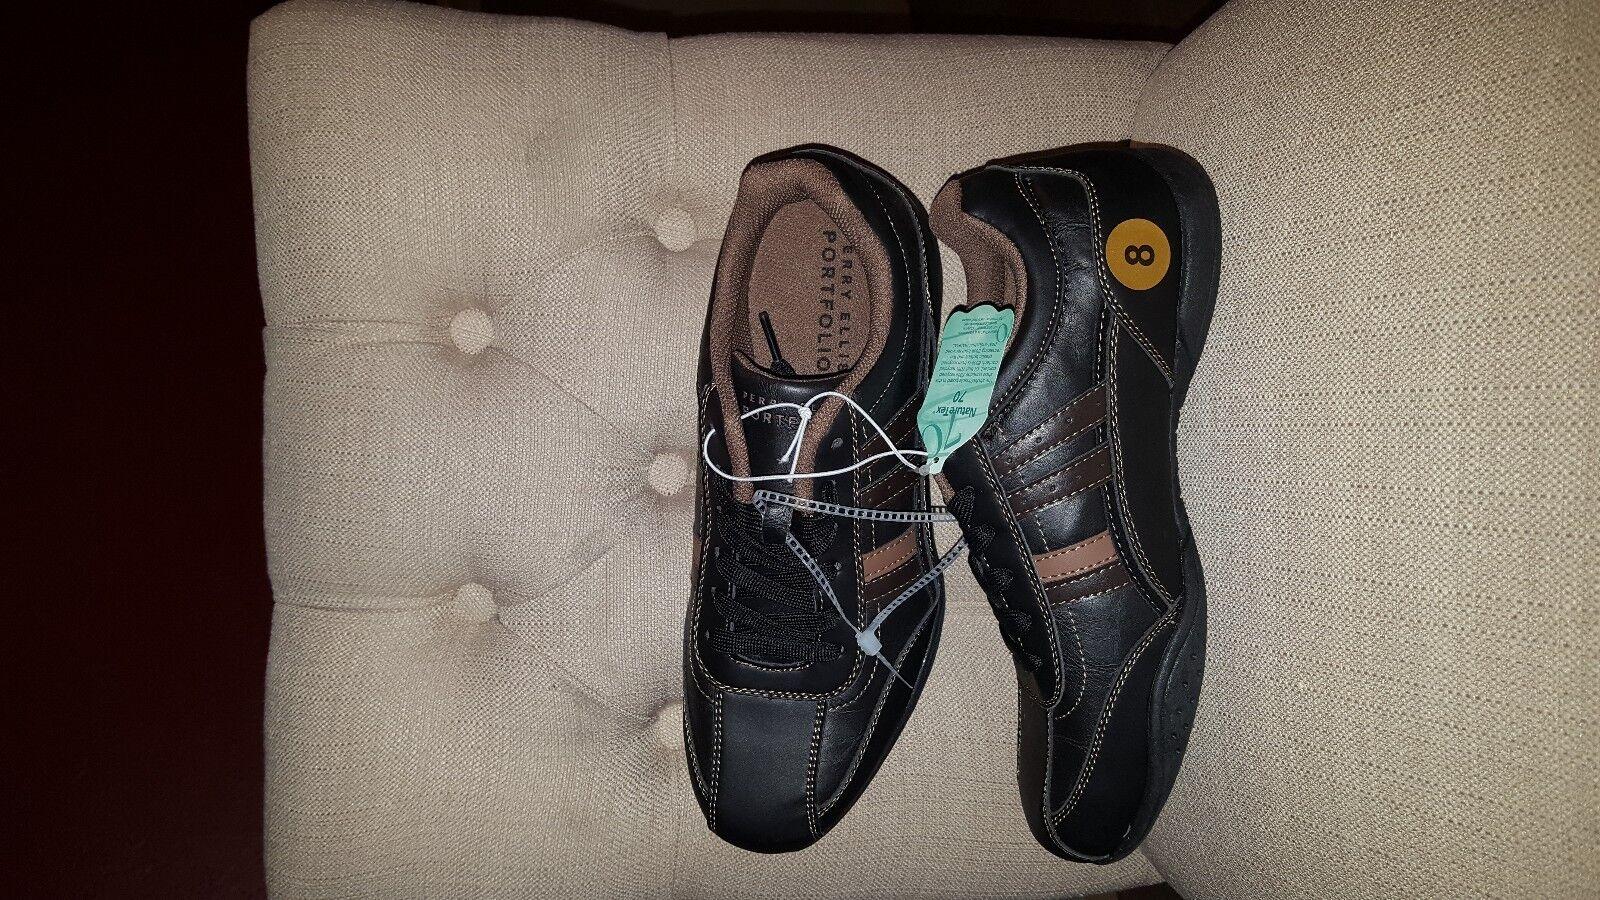 PERRY ELLIS AMERICA Men's casual leather walking shoe Brown Size 8